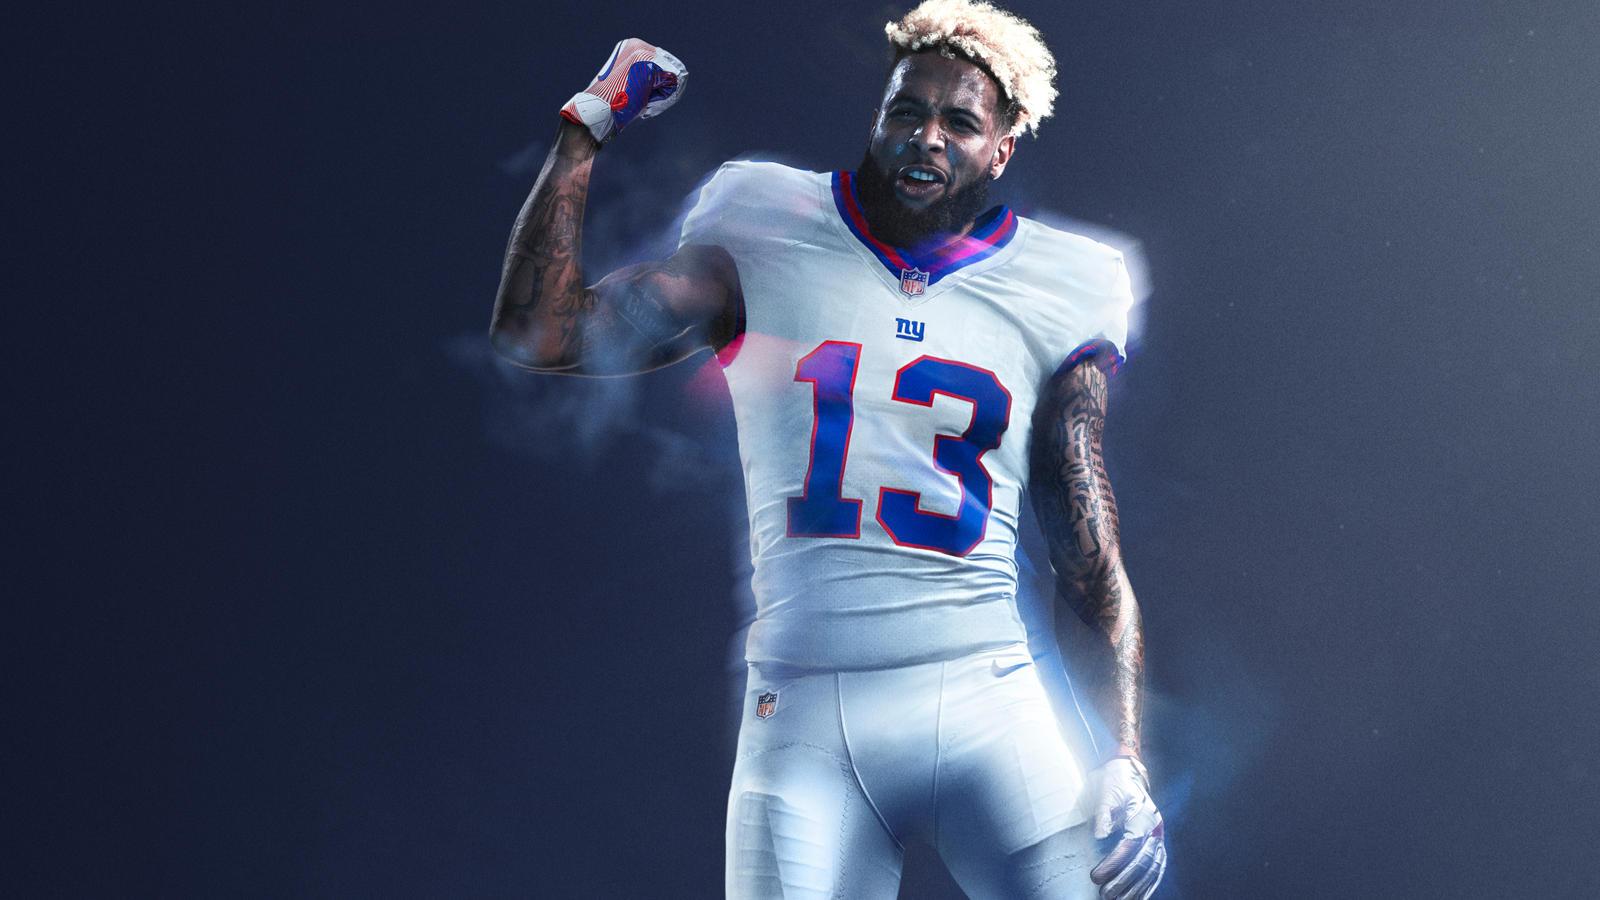 Tom Brady Wallpaper Quote Nike And Nfl Light Up Thursday Night Football Nike News